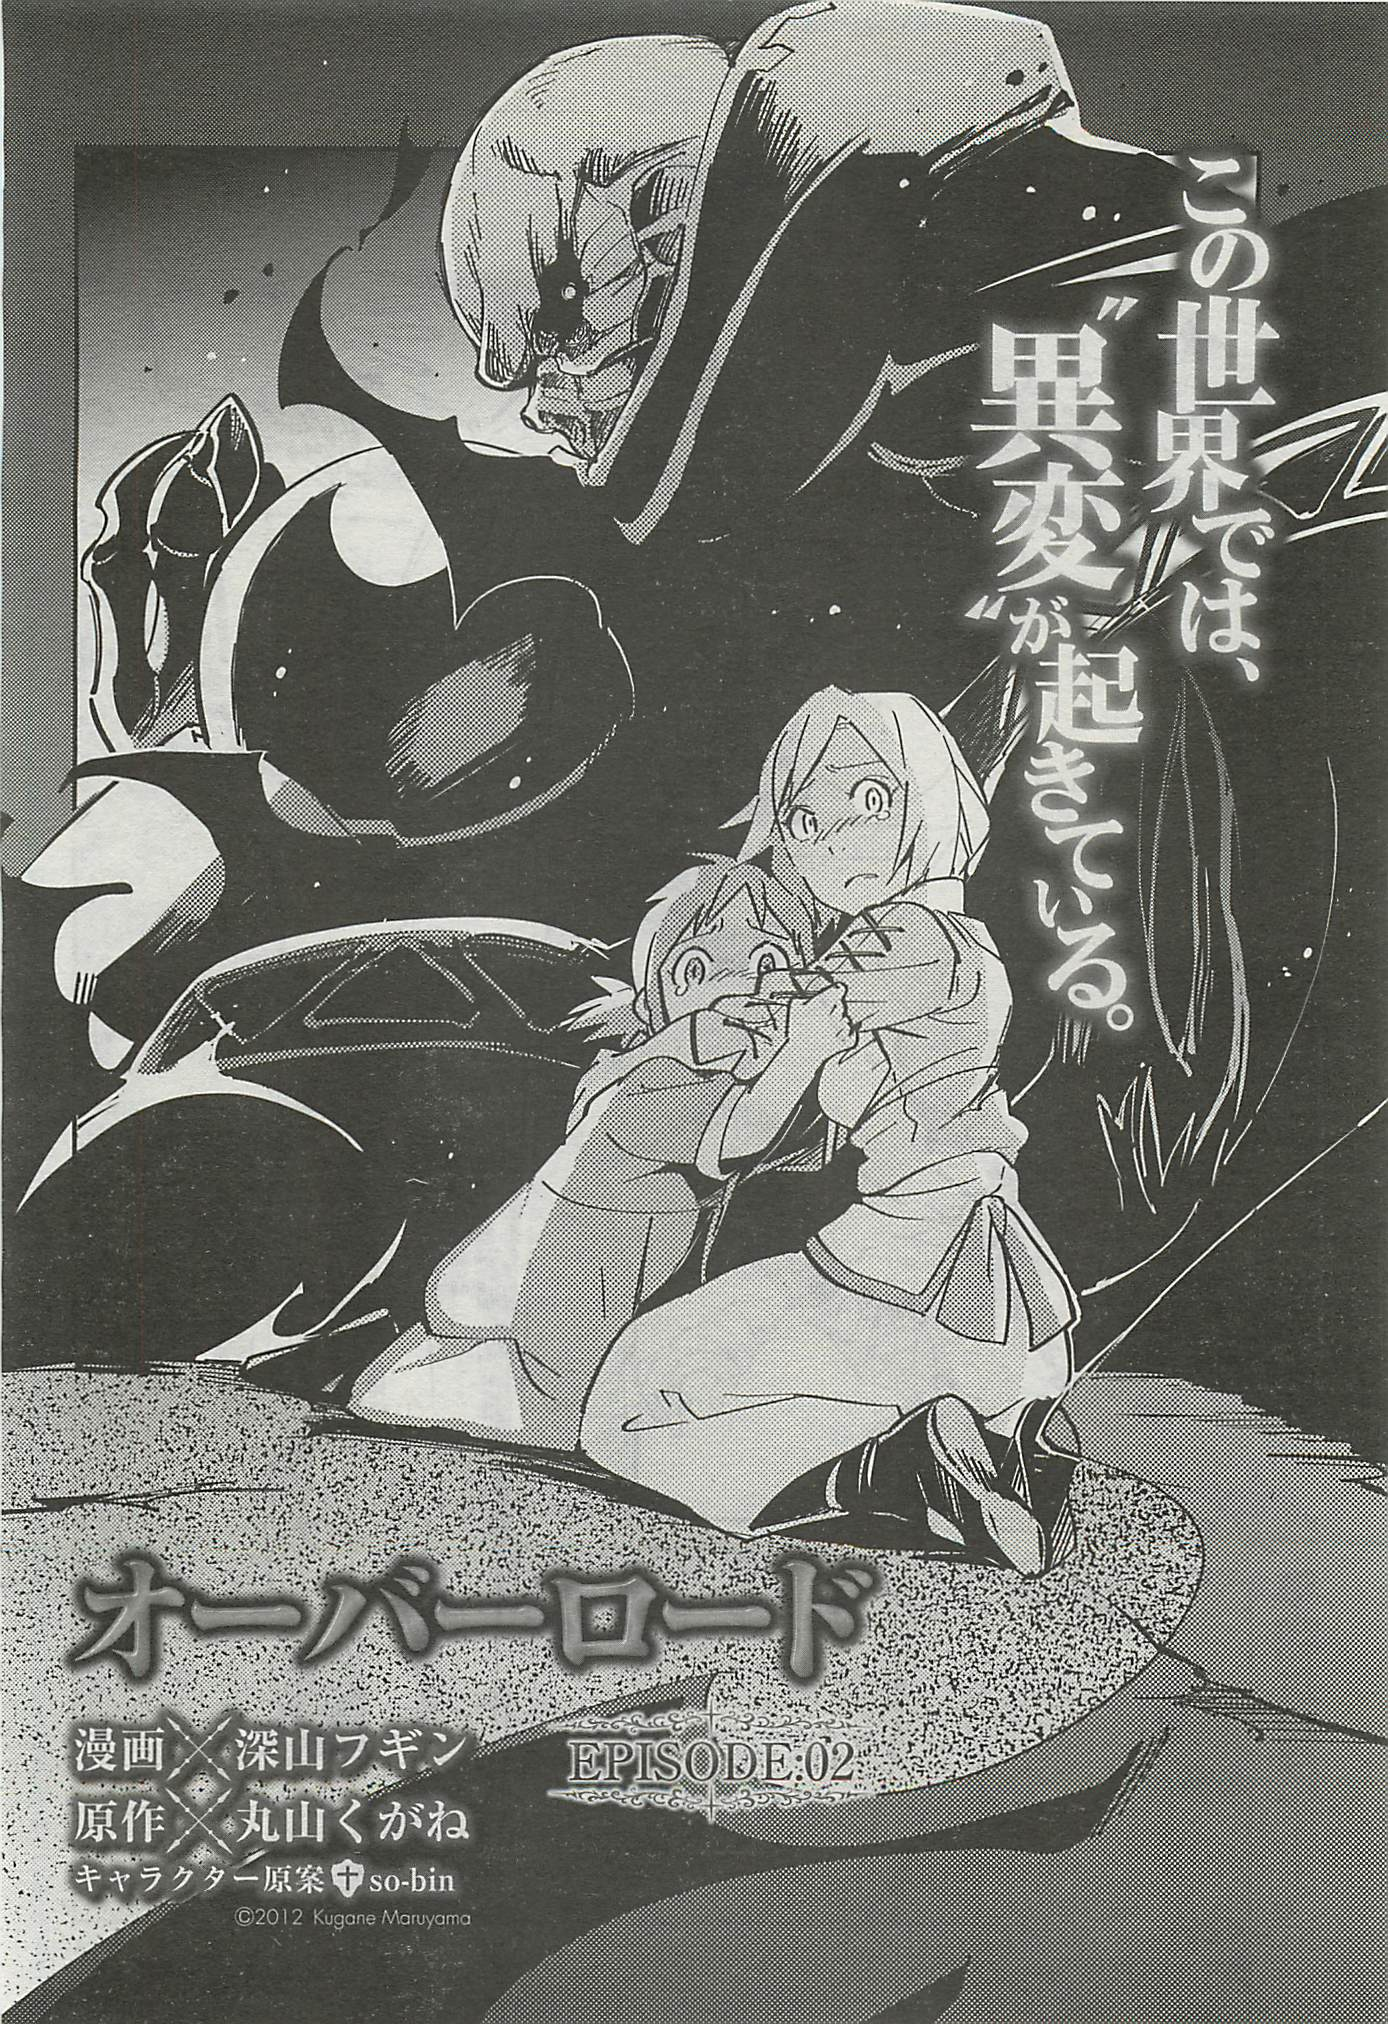 Overlord Manga Chapter 02